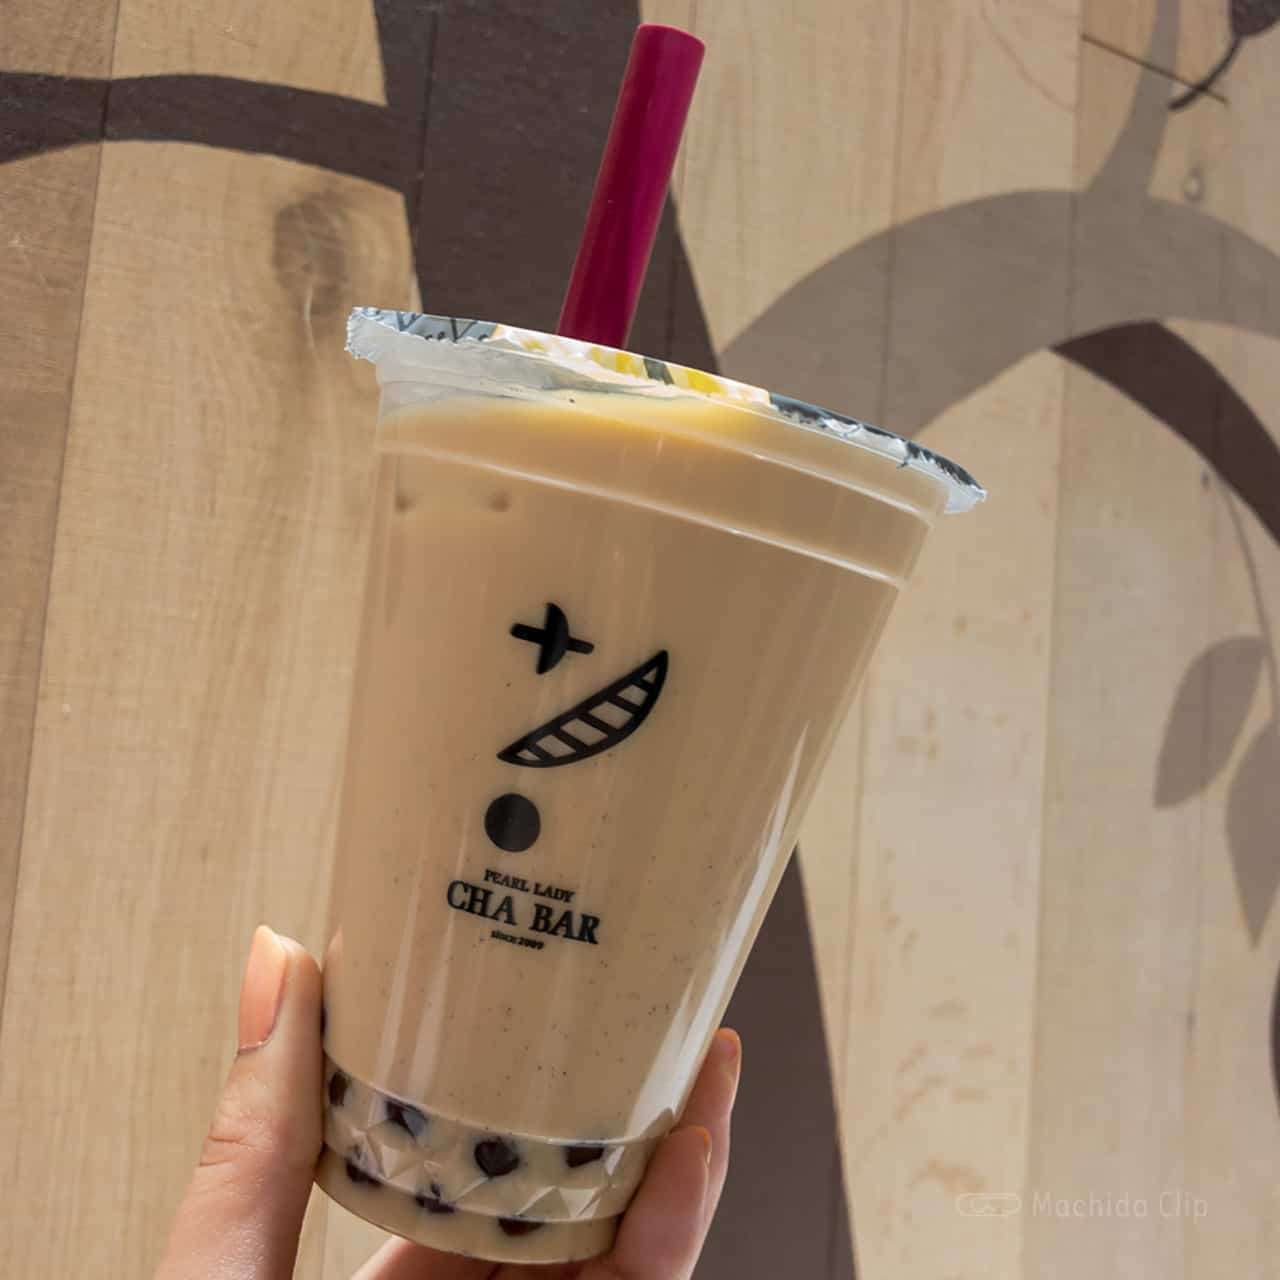 Pearl Lady Cha Bar, Tokyo, Milk Tea, ชานมไข่มุก